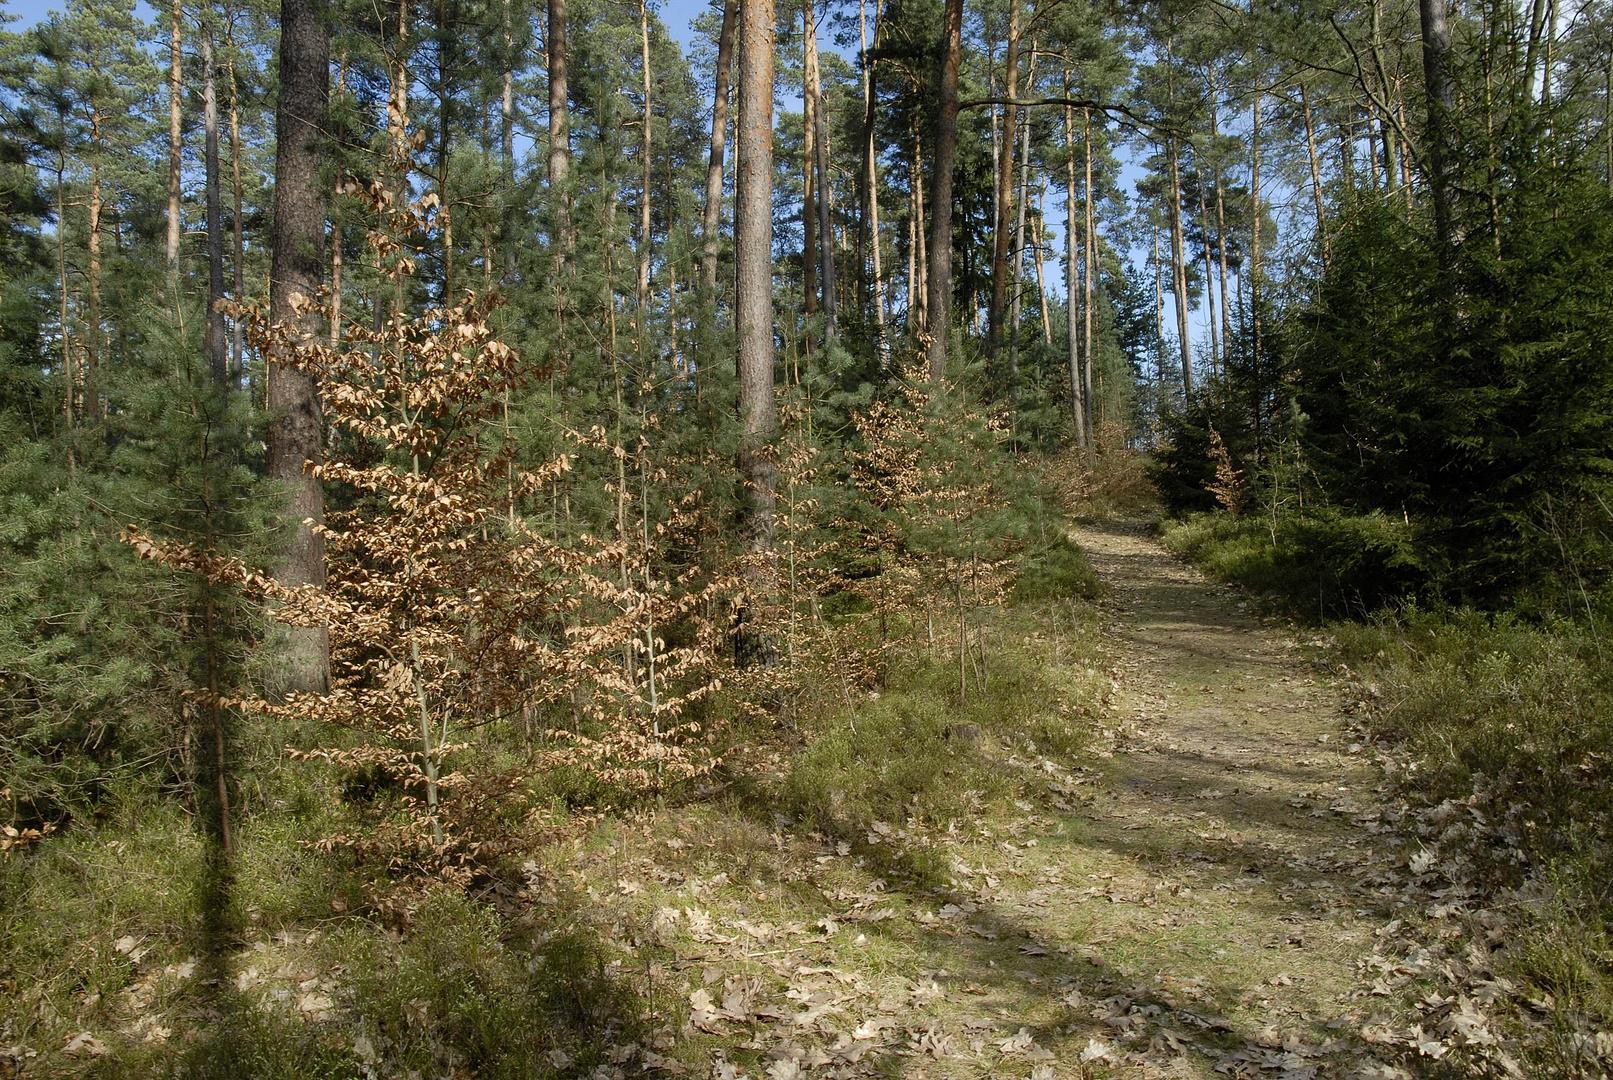 Nürnberger Reichswald, Waldweg im April